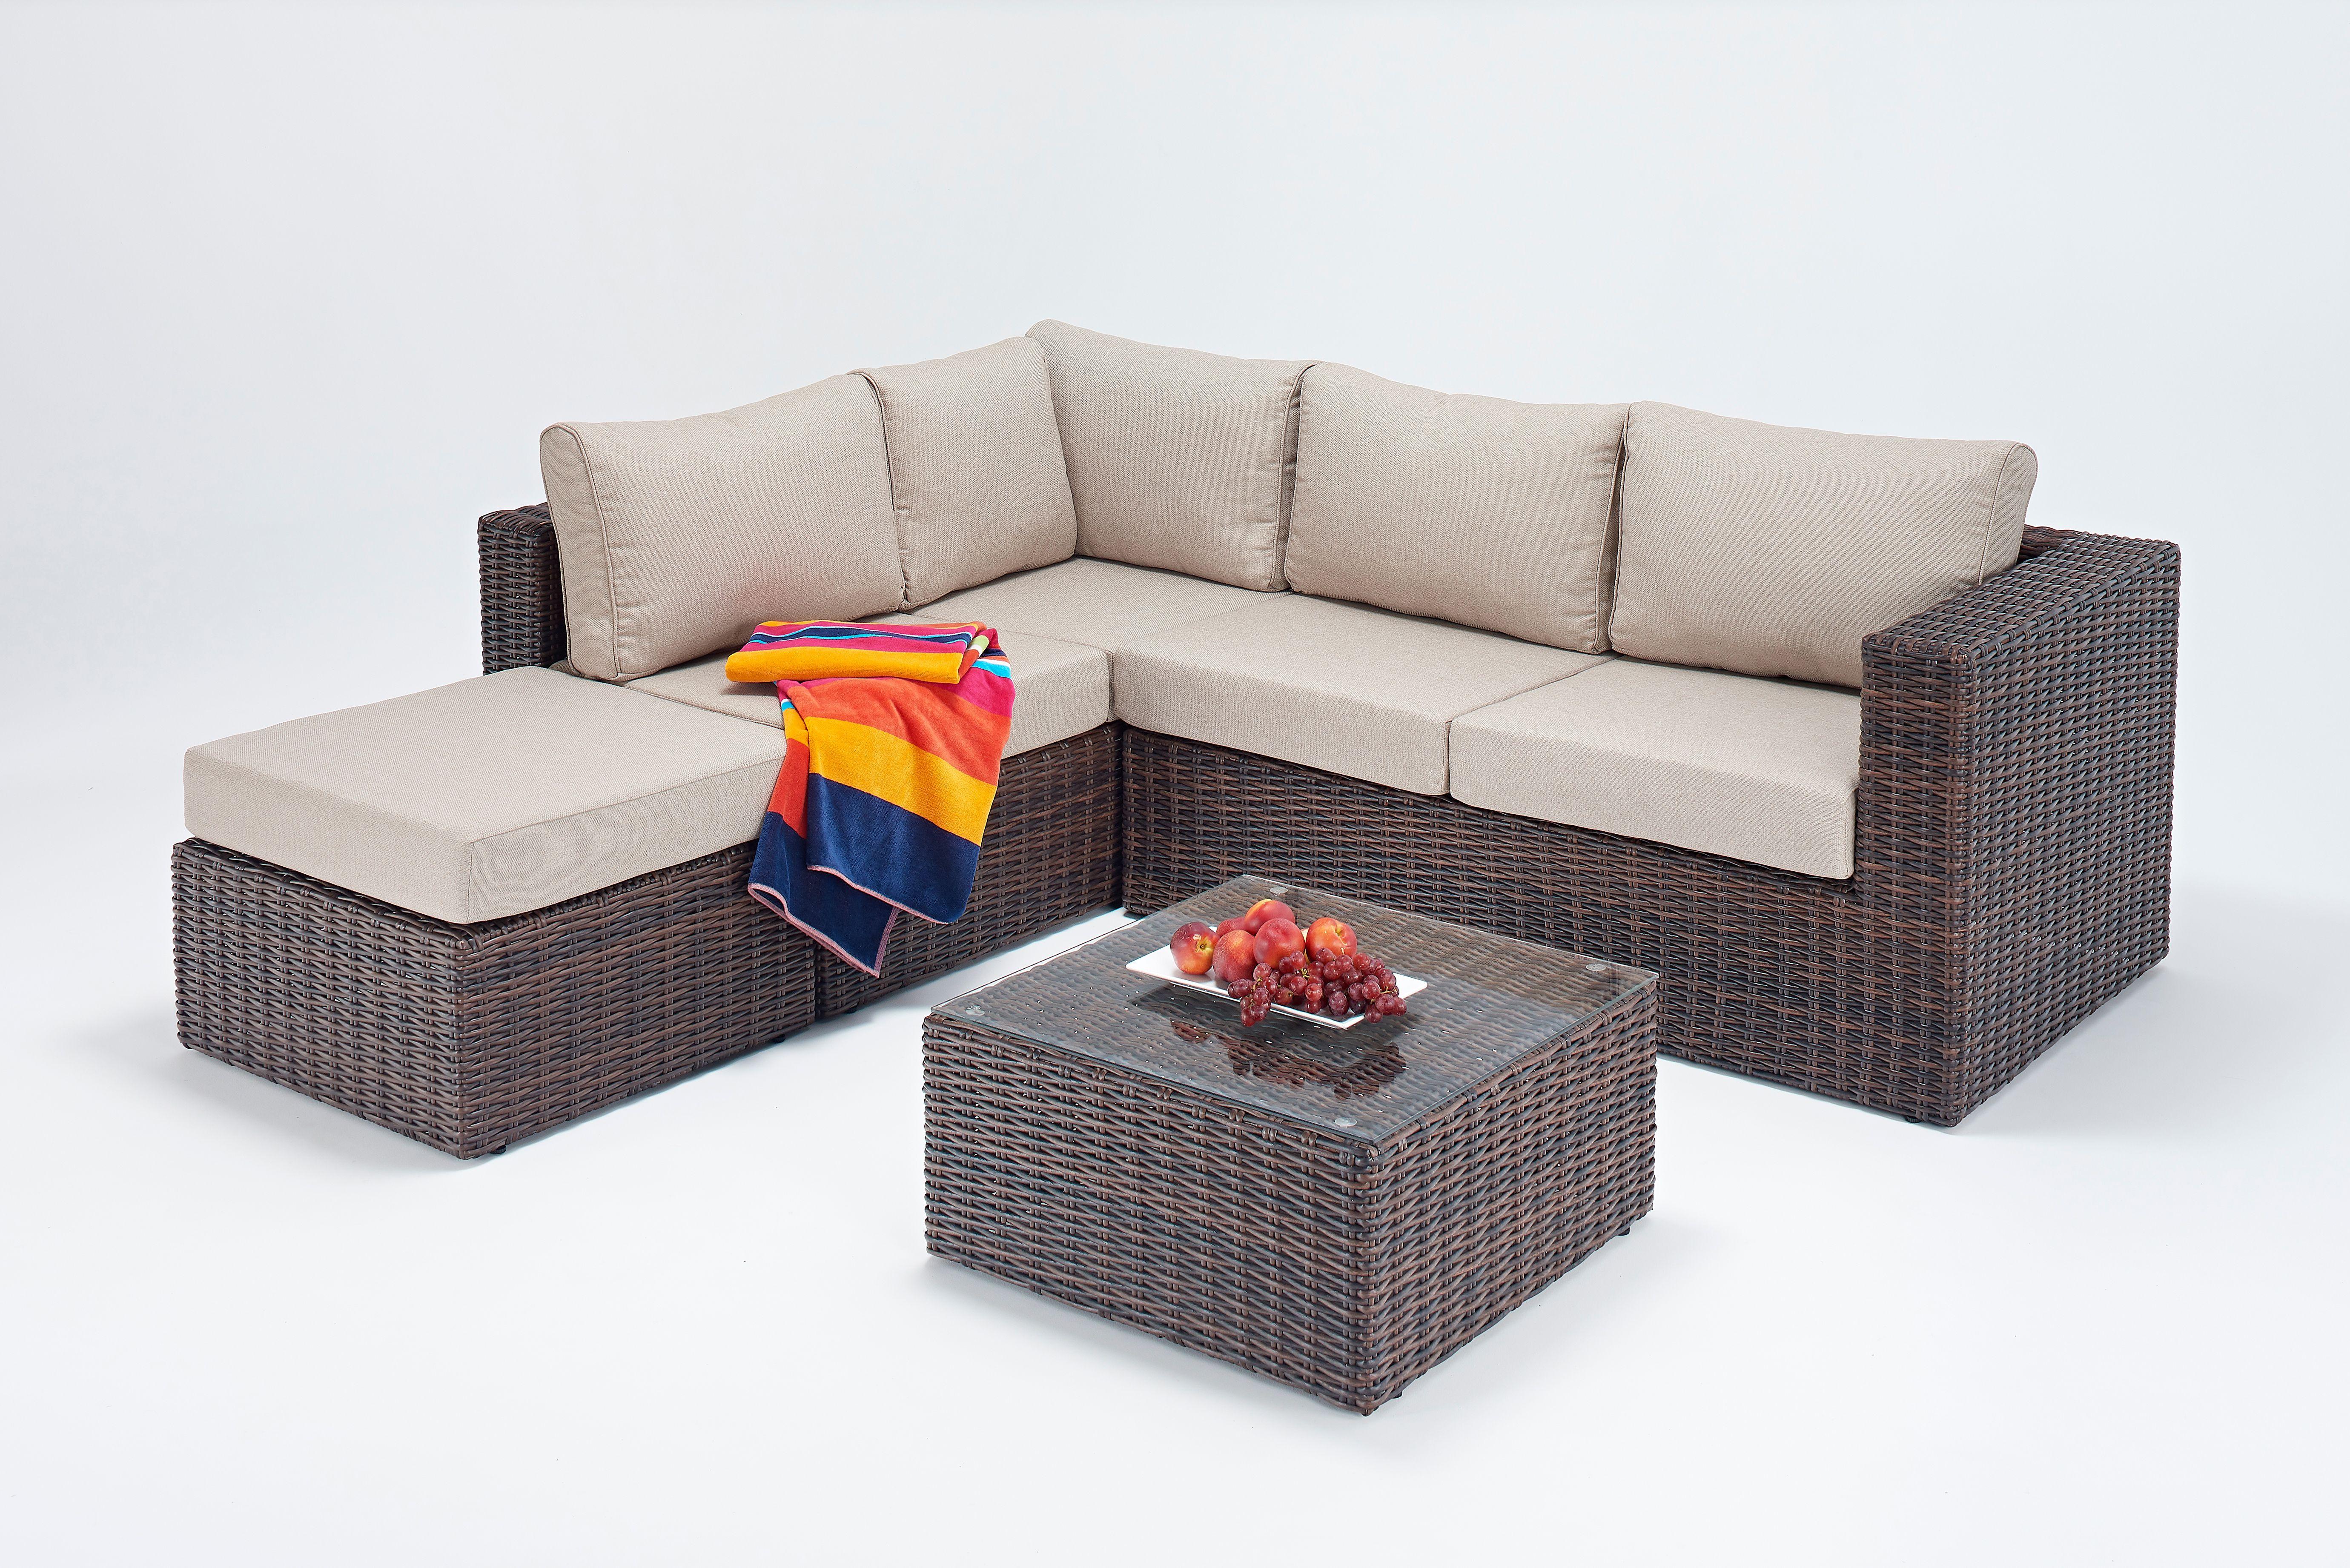 Brown Round Poly Rattan With Cream Cushions Left Hand Facing Rattan Corner Sofa Small Corner Sofa Corner Sofa Set